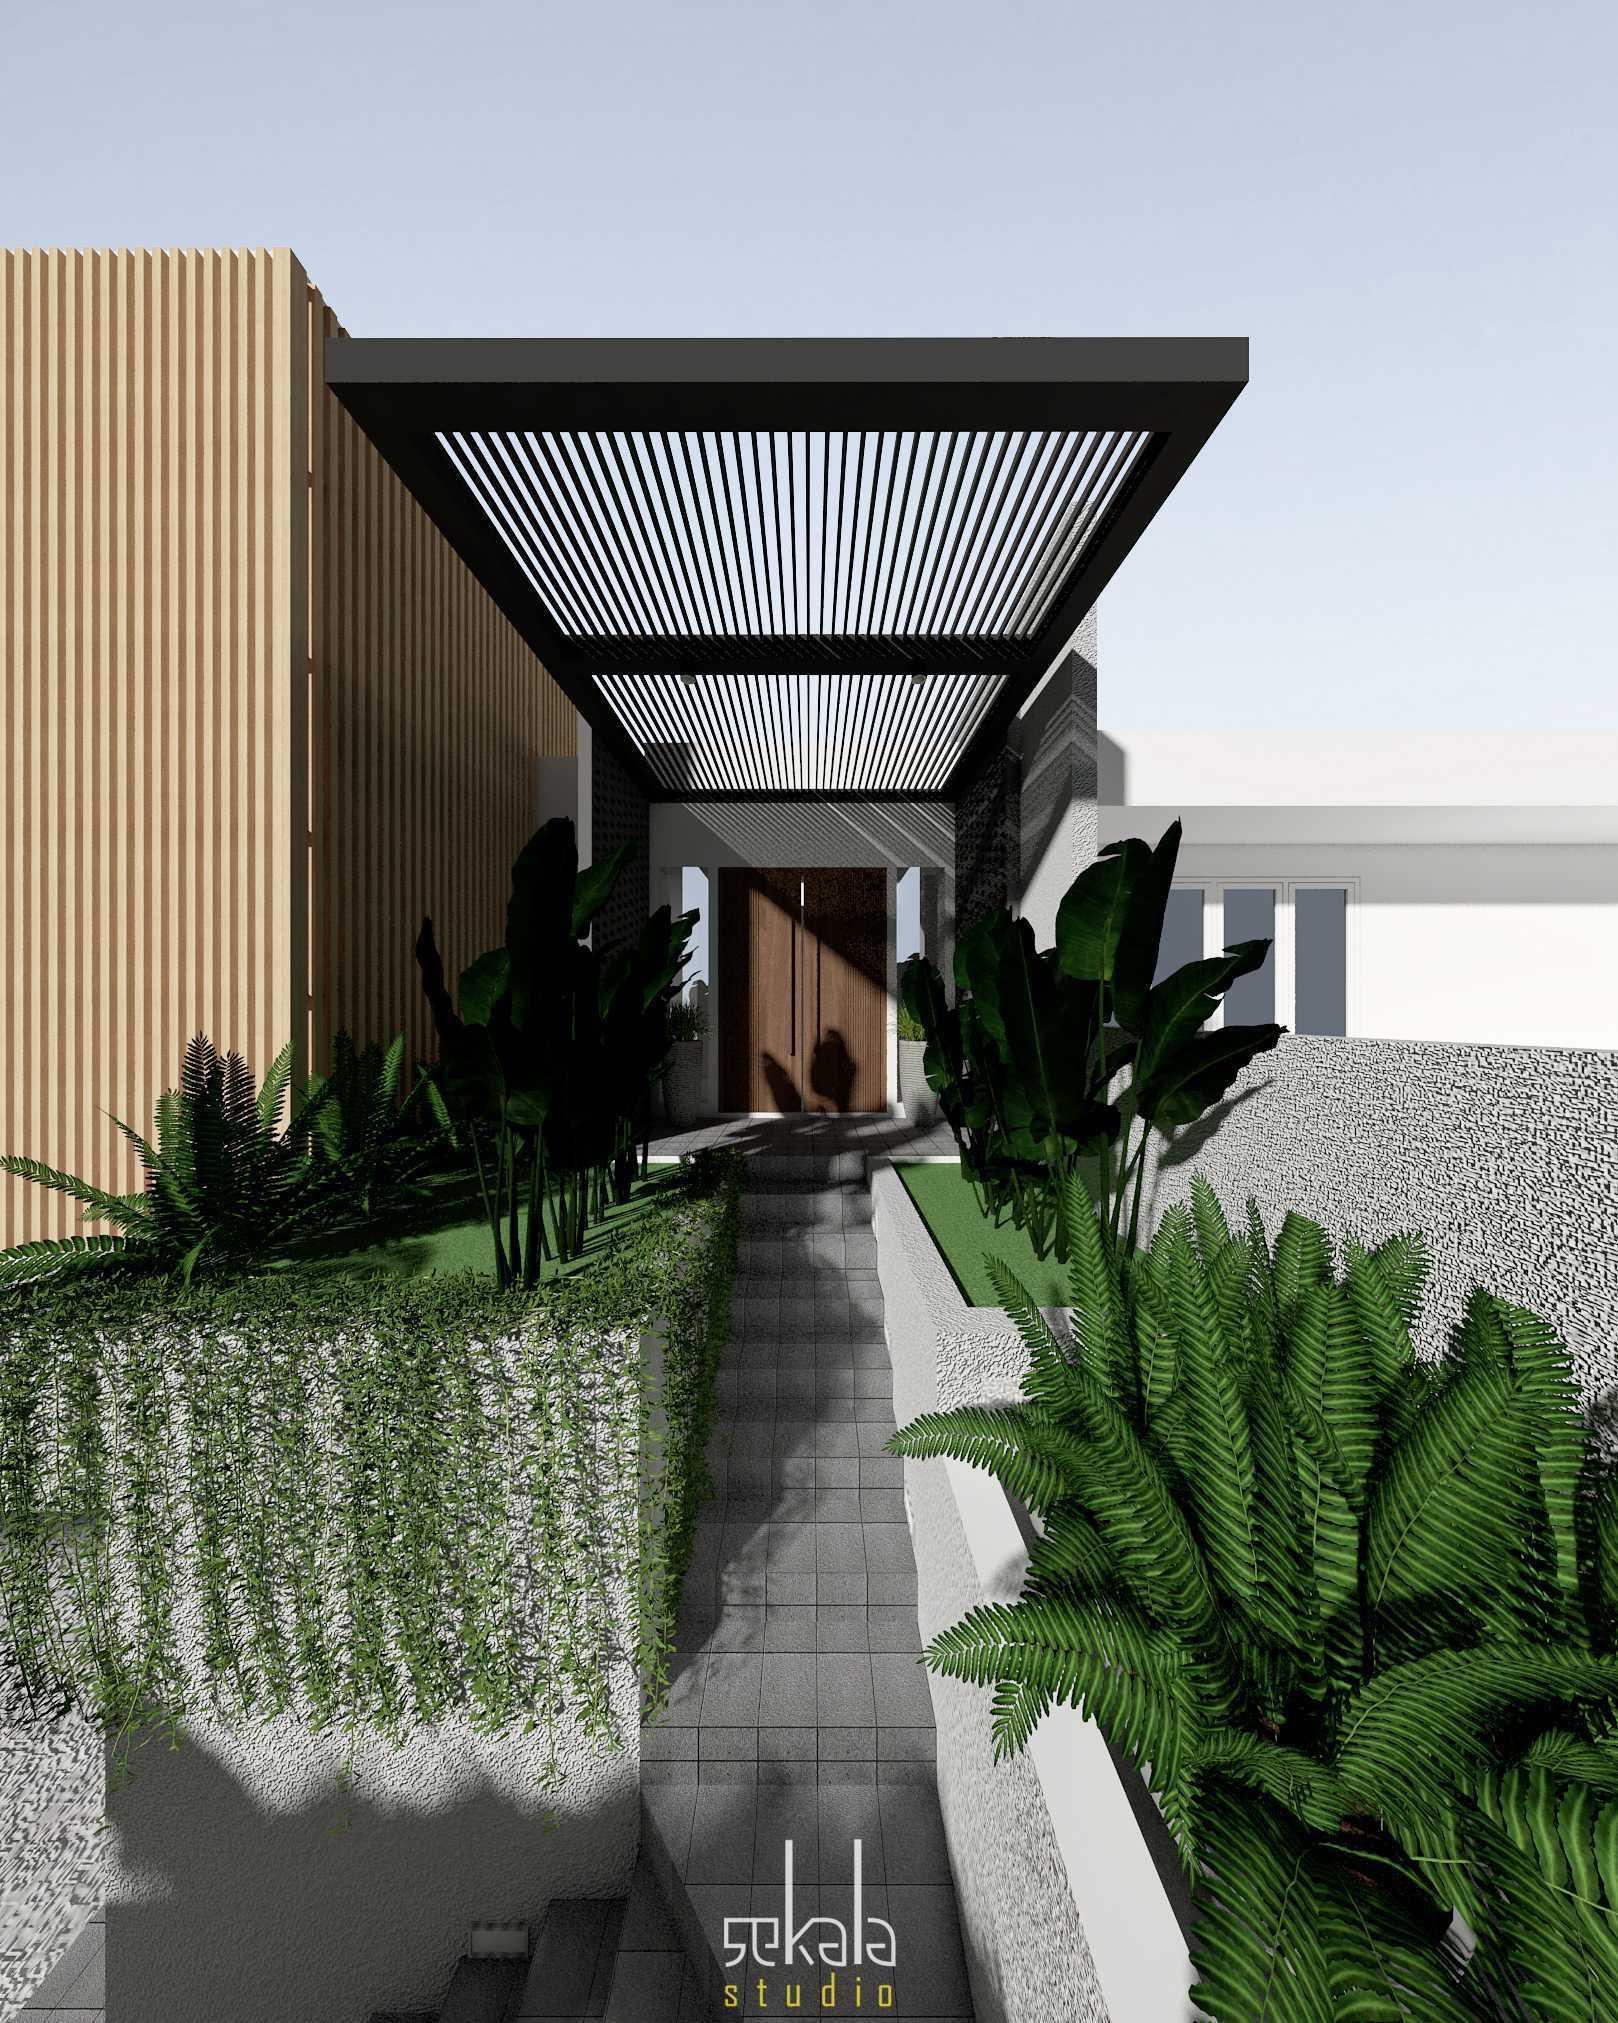 Sekala Basic Shape House Surabaya, Kota Sby, Jawa Timur, Indonesia Jl. Bumi Marina Emas Utara No.ii, Keputih, Kec. Sukolilo, Kota Sby, Jawa Timur 60111, Indonesia Sekala-Rumah-Keputih  <P>A House With 2 Floor.&nbsp;</p> <P>Size Of Land : 12X20M</p> <P>Size Of Area ; 450M2</p> <P>Natural Colour ; White, Grey, Unfinished, Wood Texture,&nbsp;</p> <P>With Variety Of Plants And Trees</p> 81711